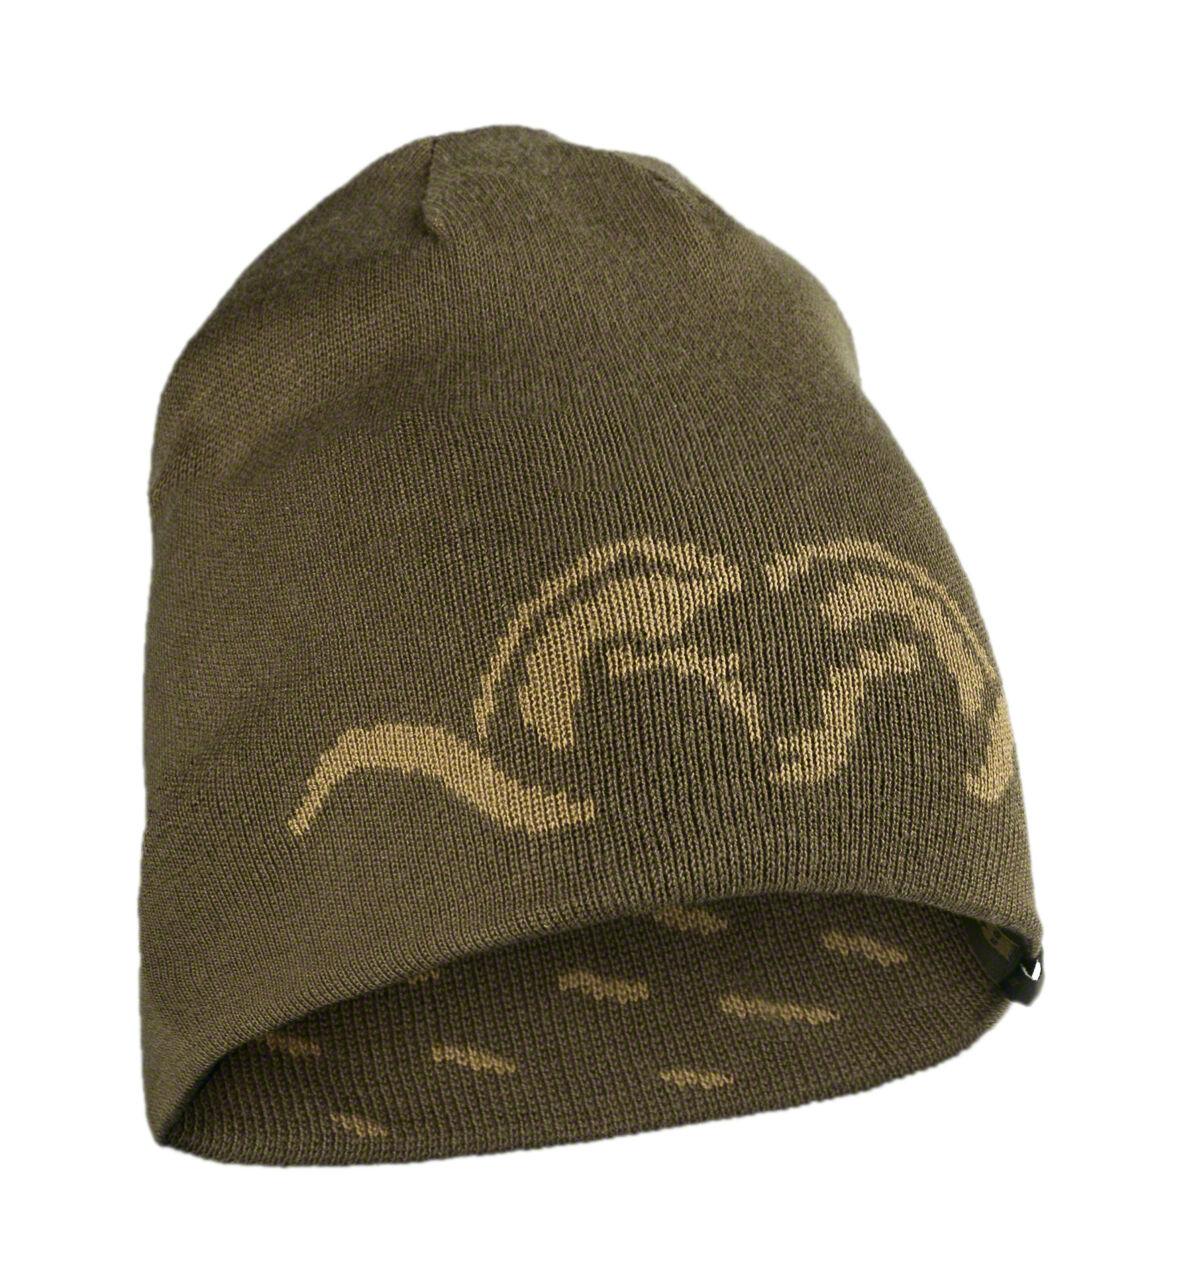 Blaser Turn Knitted Cap Argali ² - Green Khaki - 115015-028-554